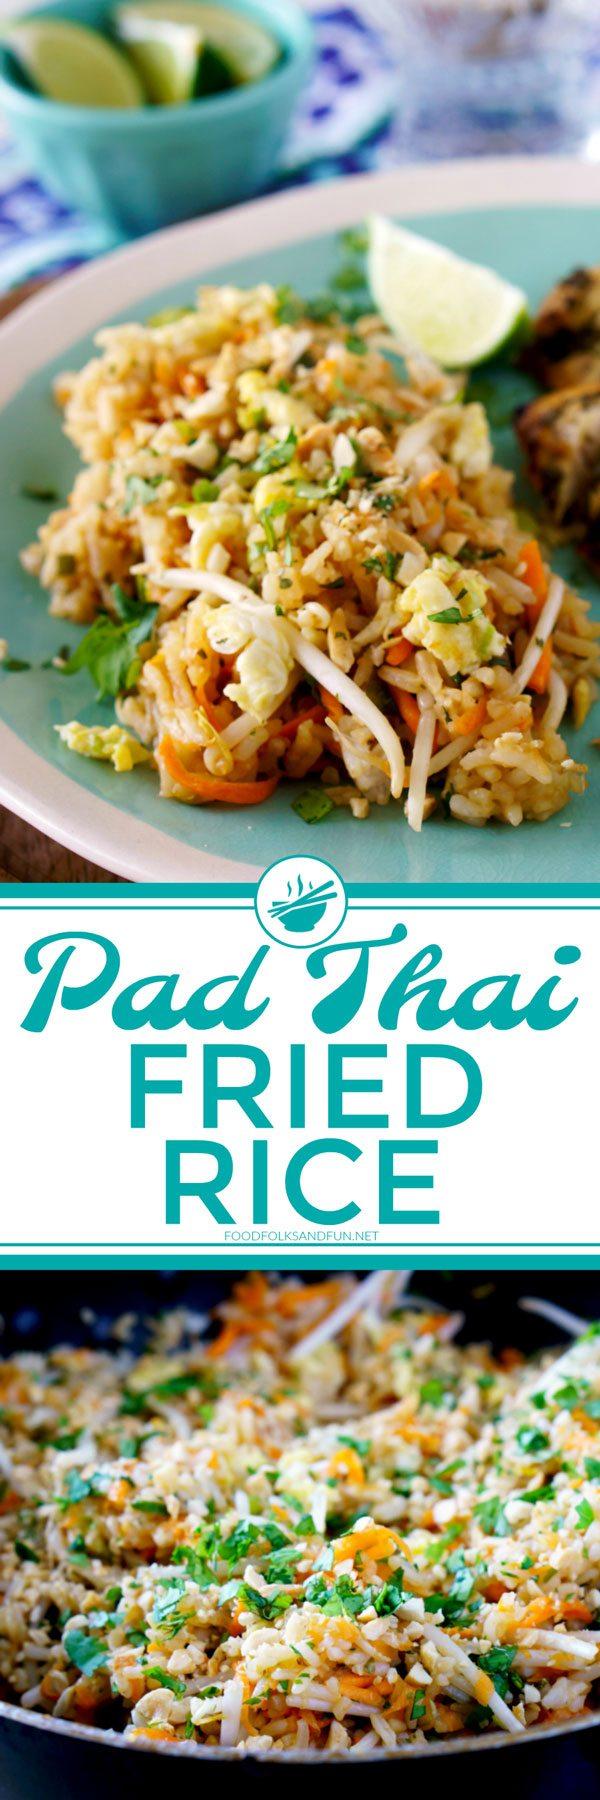 Pad Thai Fried Rice Recipe